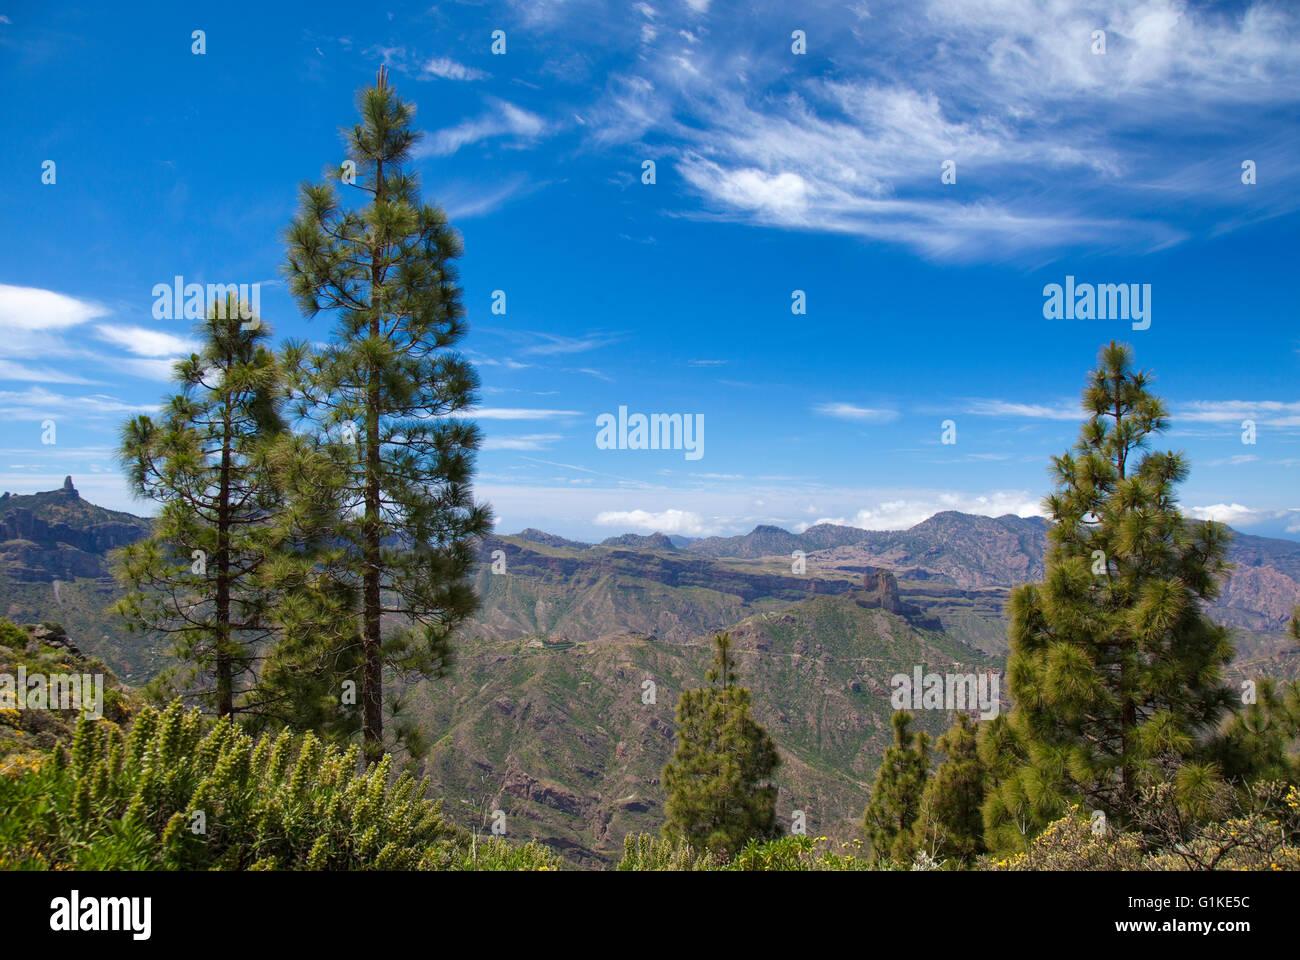 Gran Canaria, view towards Roque Bentayga from north lip of the caldera Stock Photo